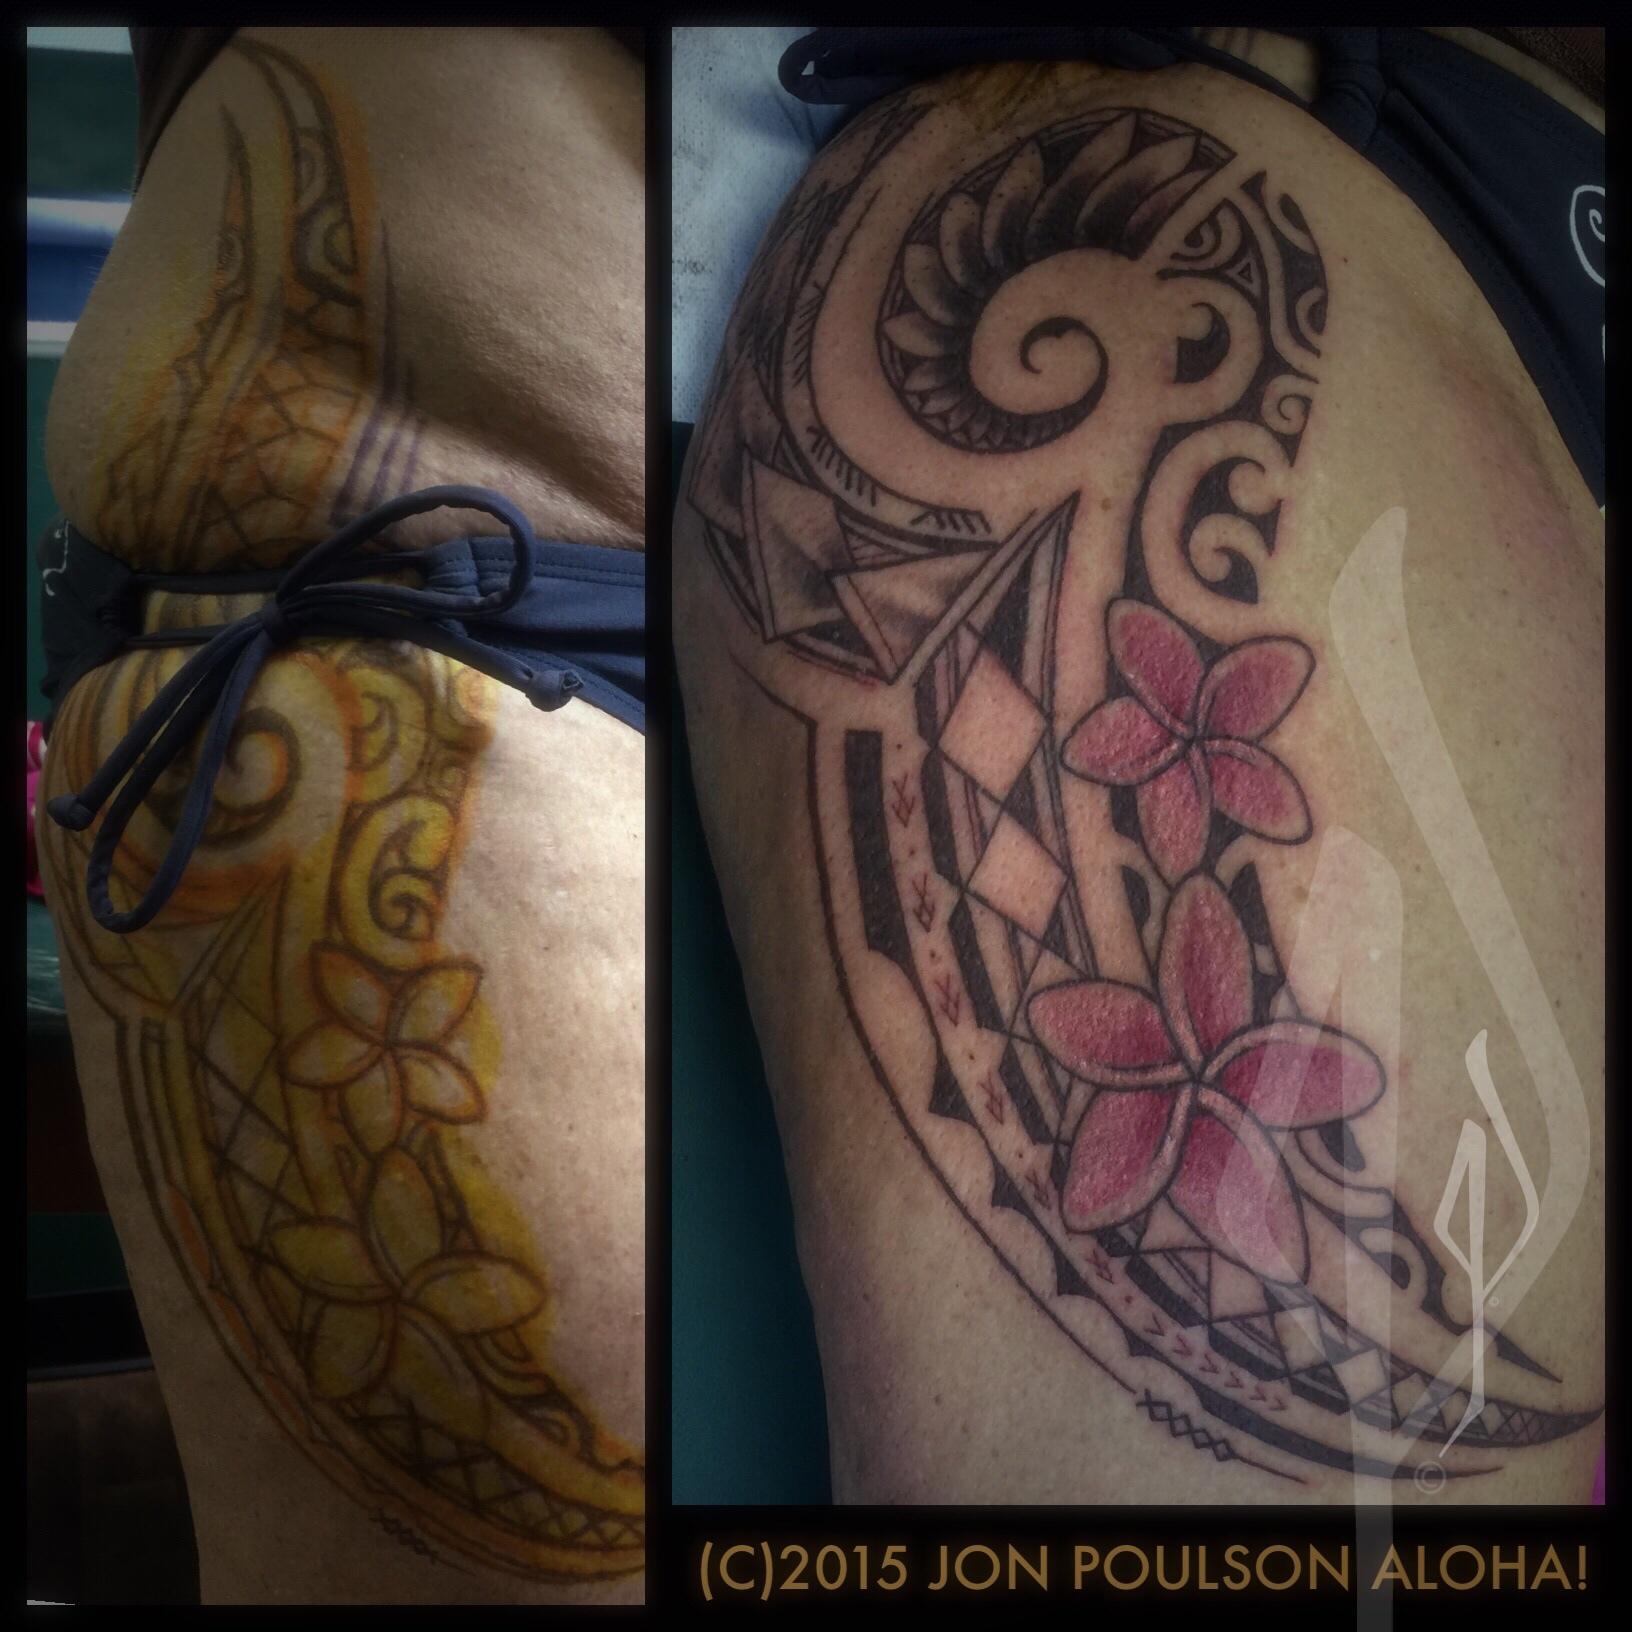 Freehand Polynesian Tribal Tattoo by Jon Poulson - Aloha Salt Lake Tattoos